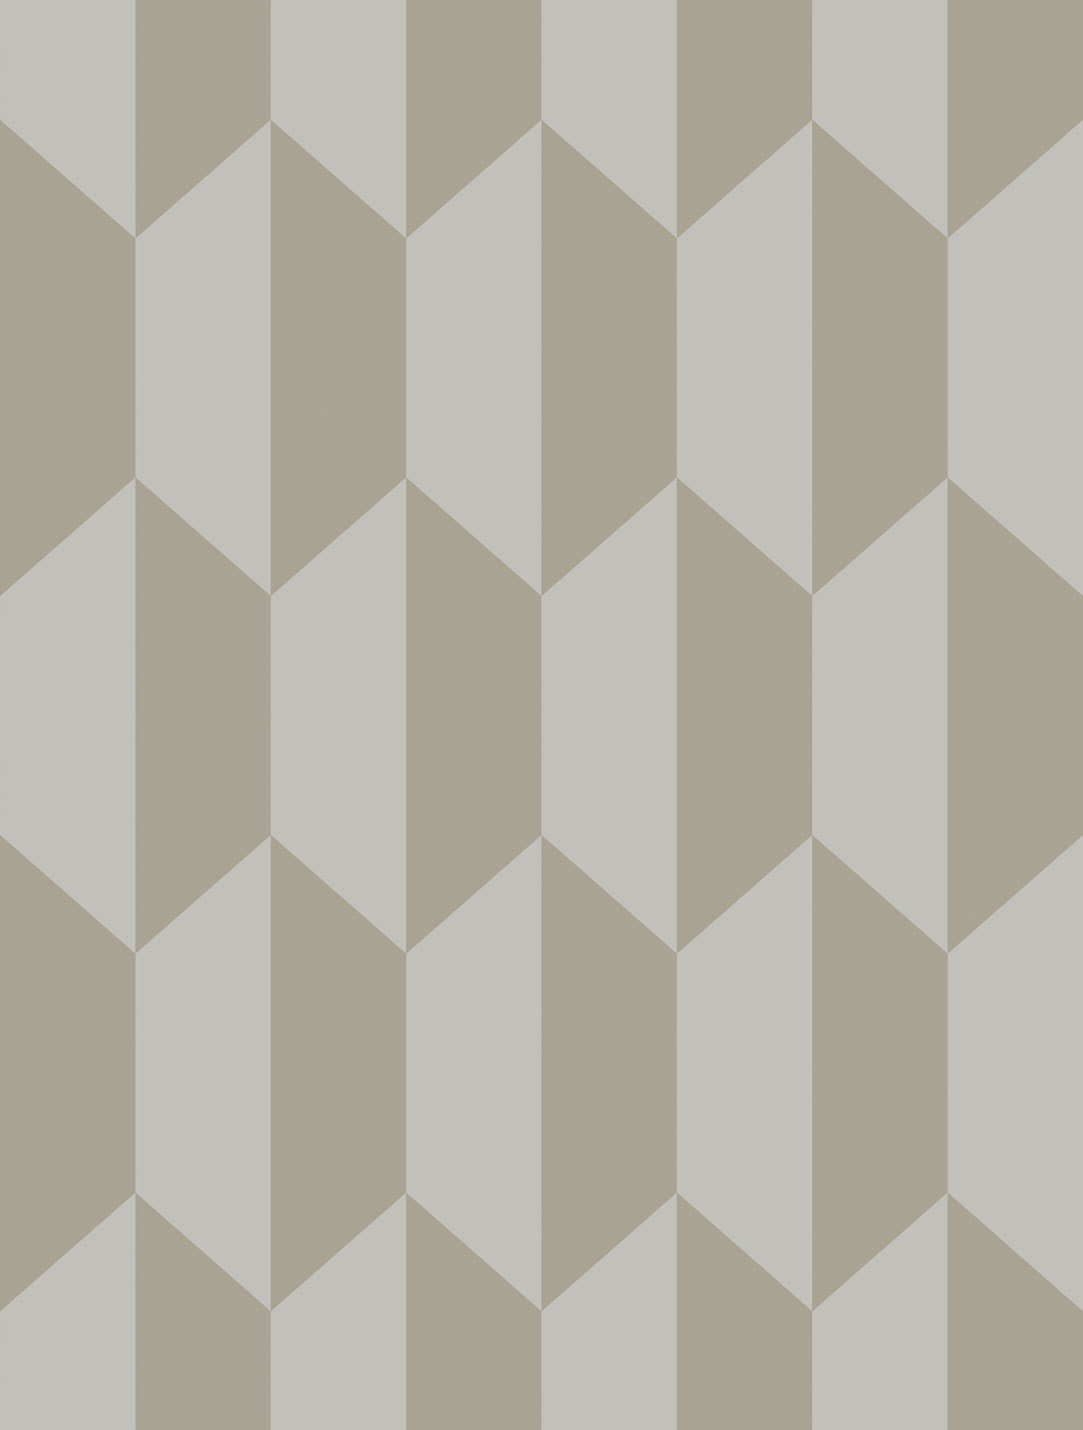 Обои Cole & Son Geometric II 105/12053, интернет магазин Волео